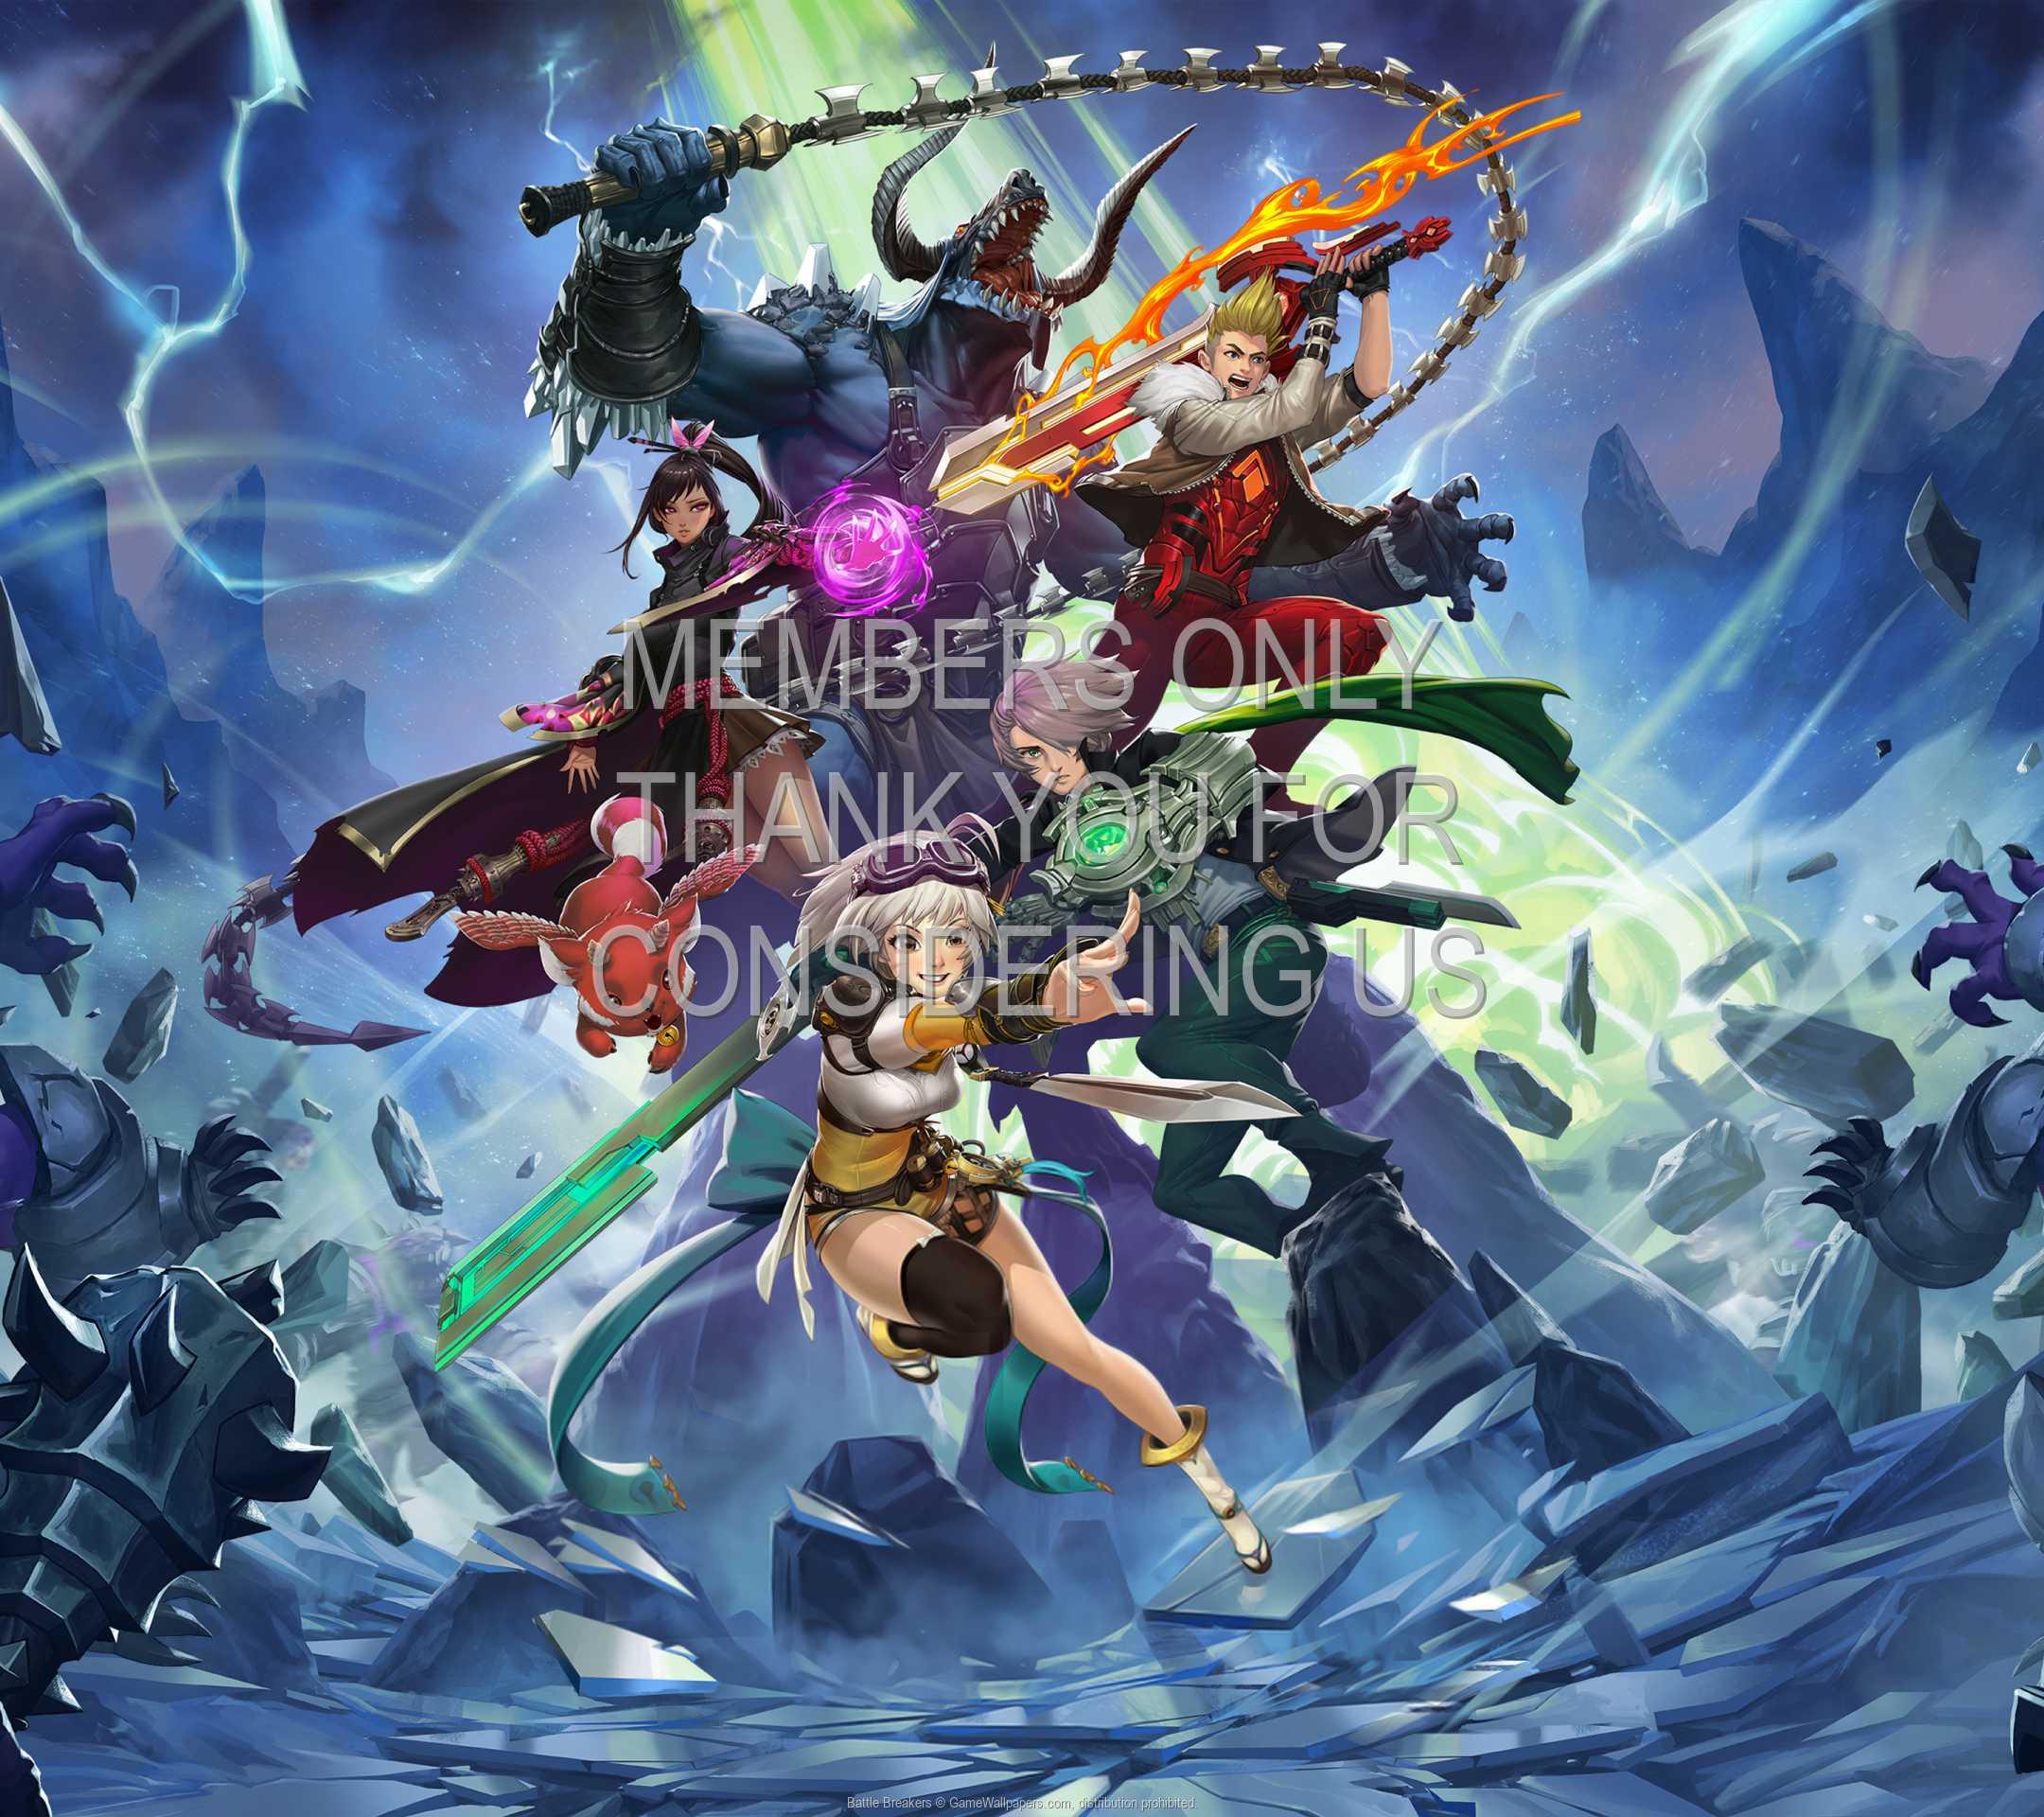 Battle Breakers 1080p Horizontal Mobile wallpaper or background 01